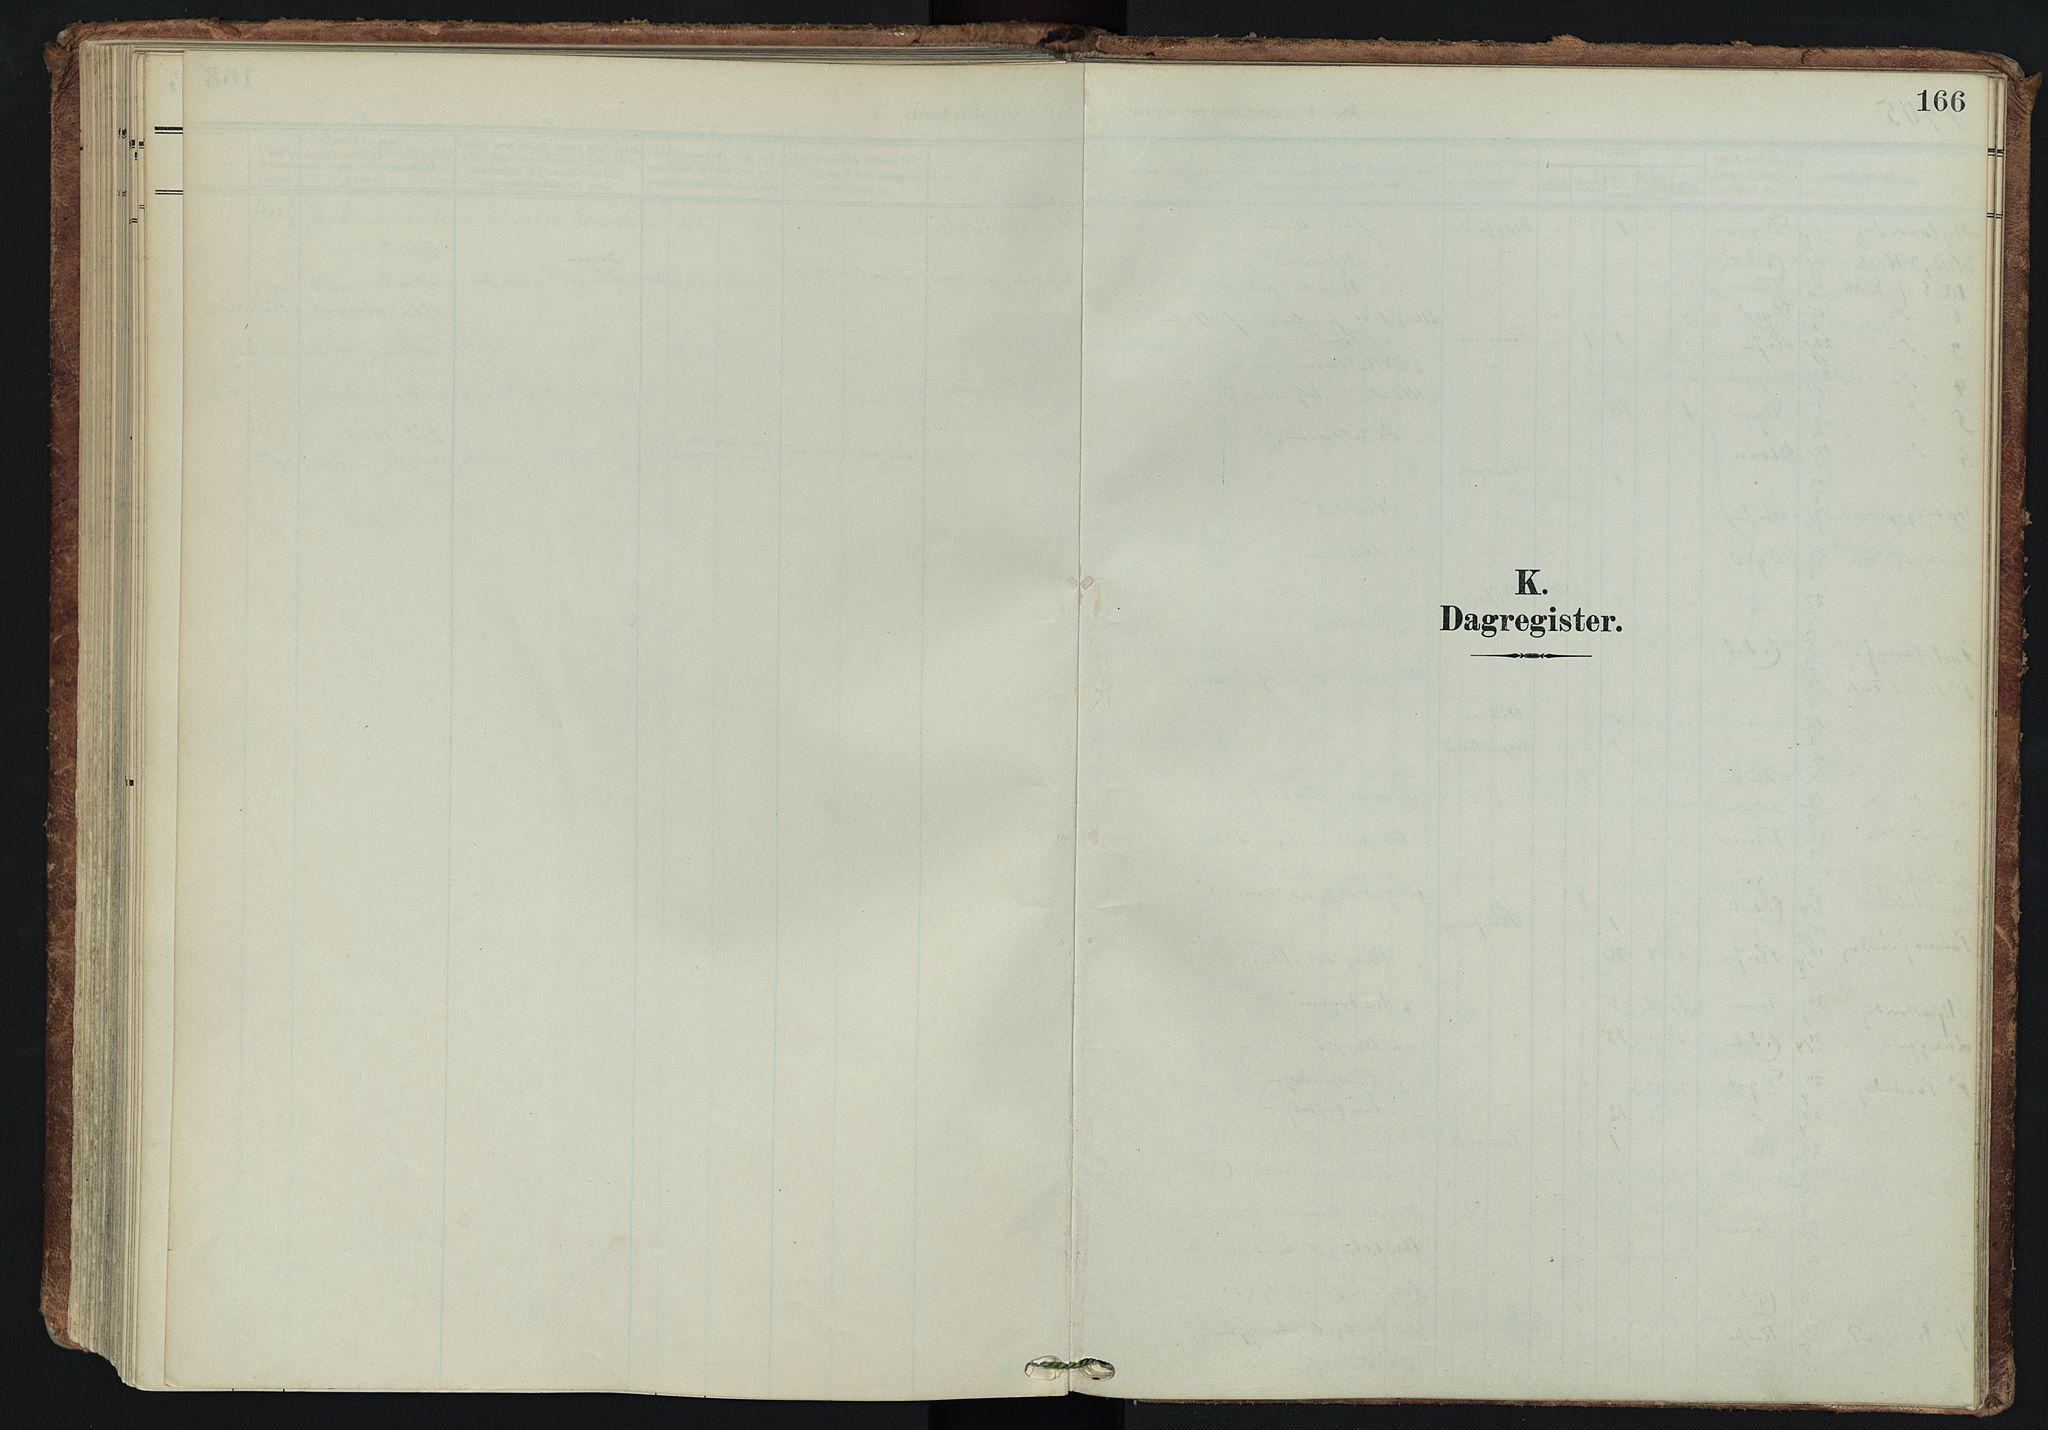 SATØ, Tranøy sokneprestkontor, I/Ia/Iaa/L0014kirke: Ministerialbok nr. 14, 1905-1919, s. 166